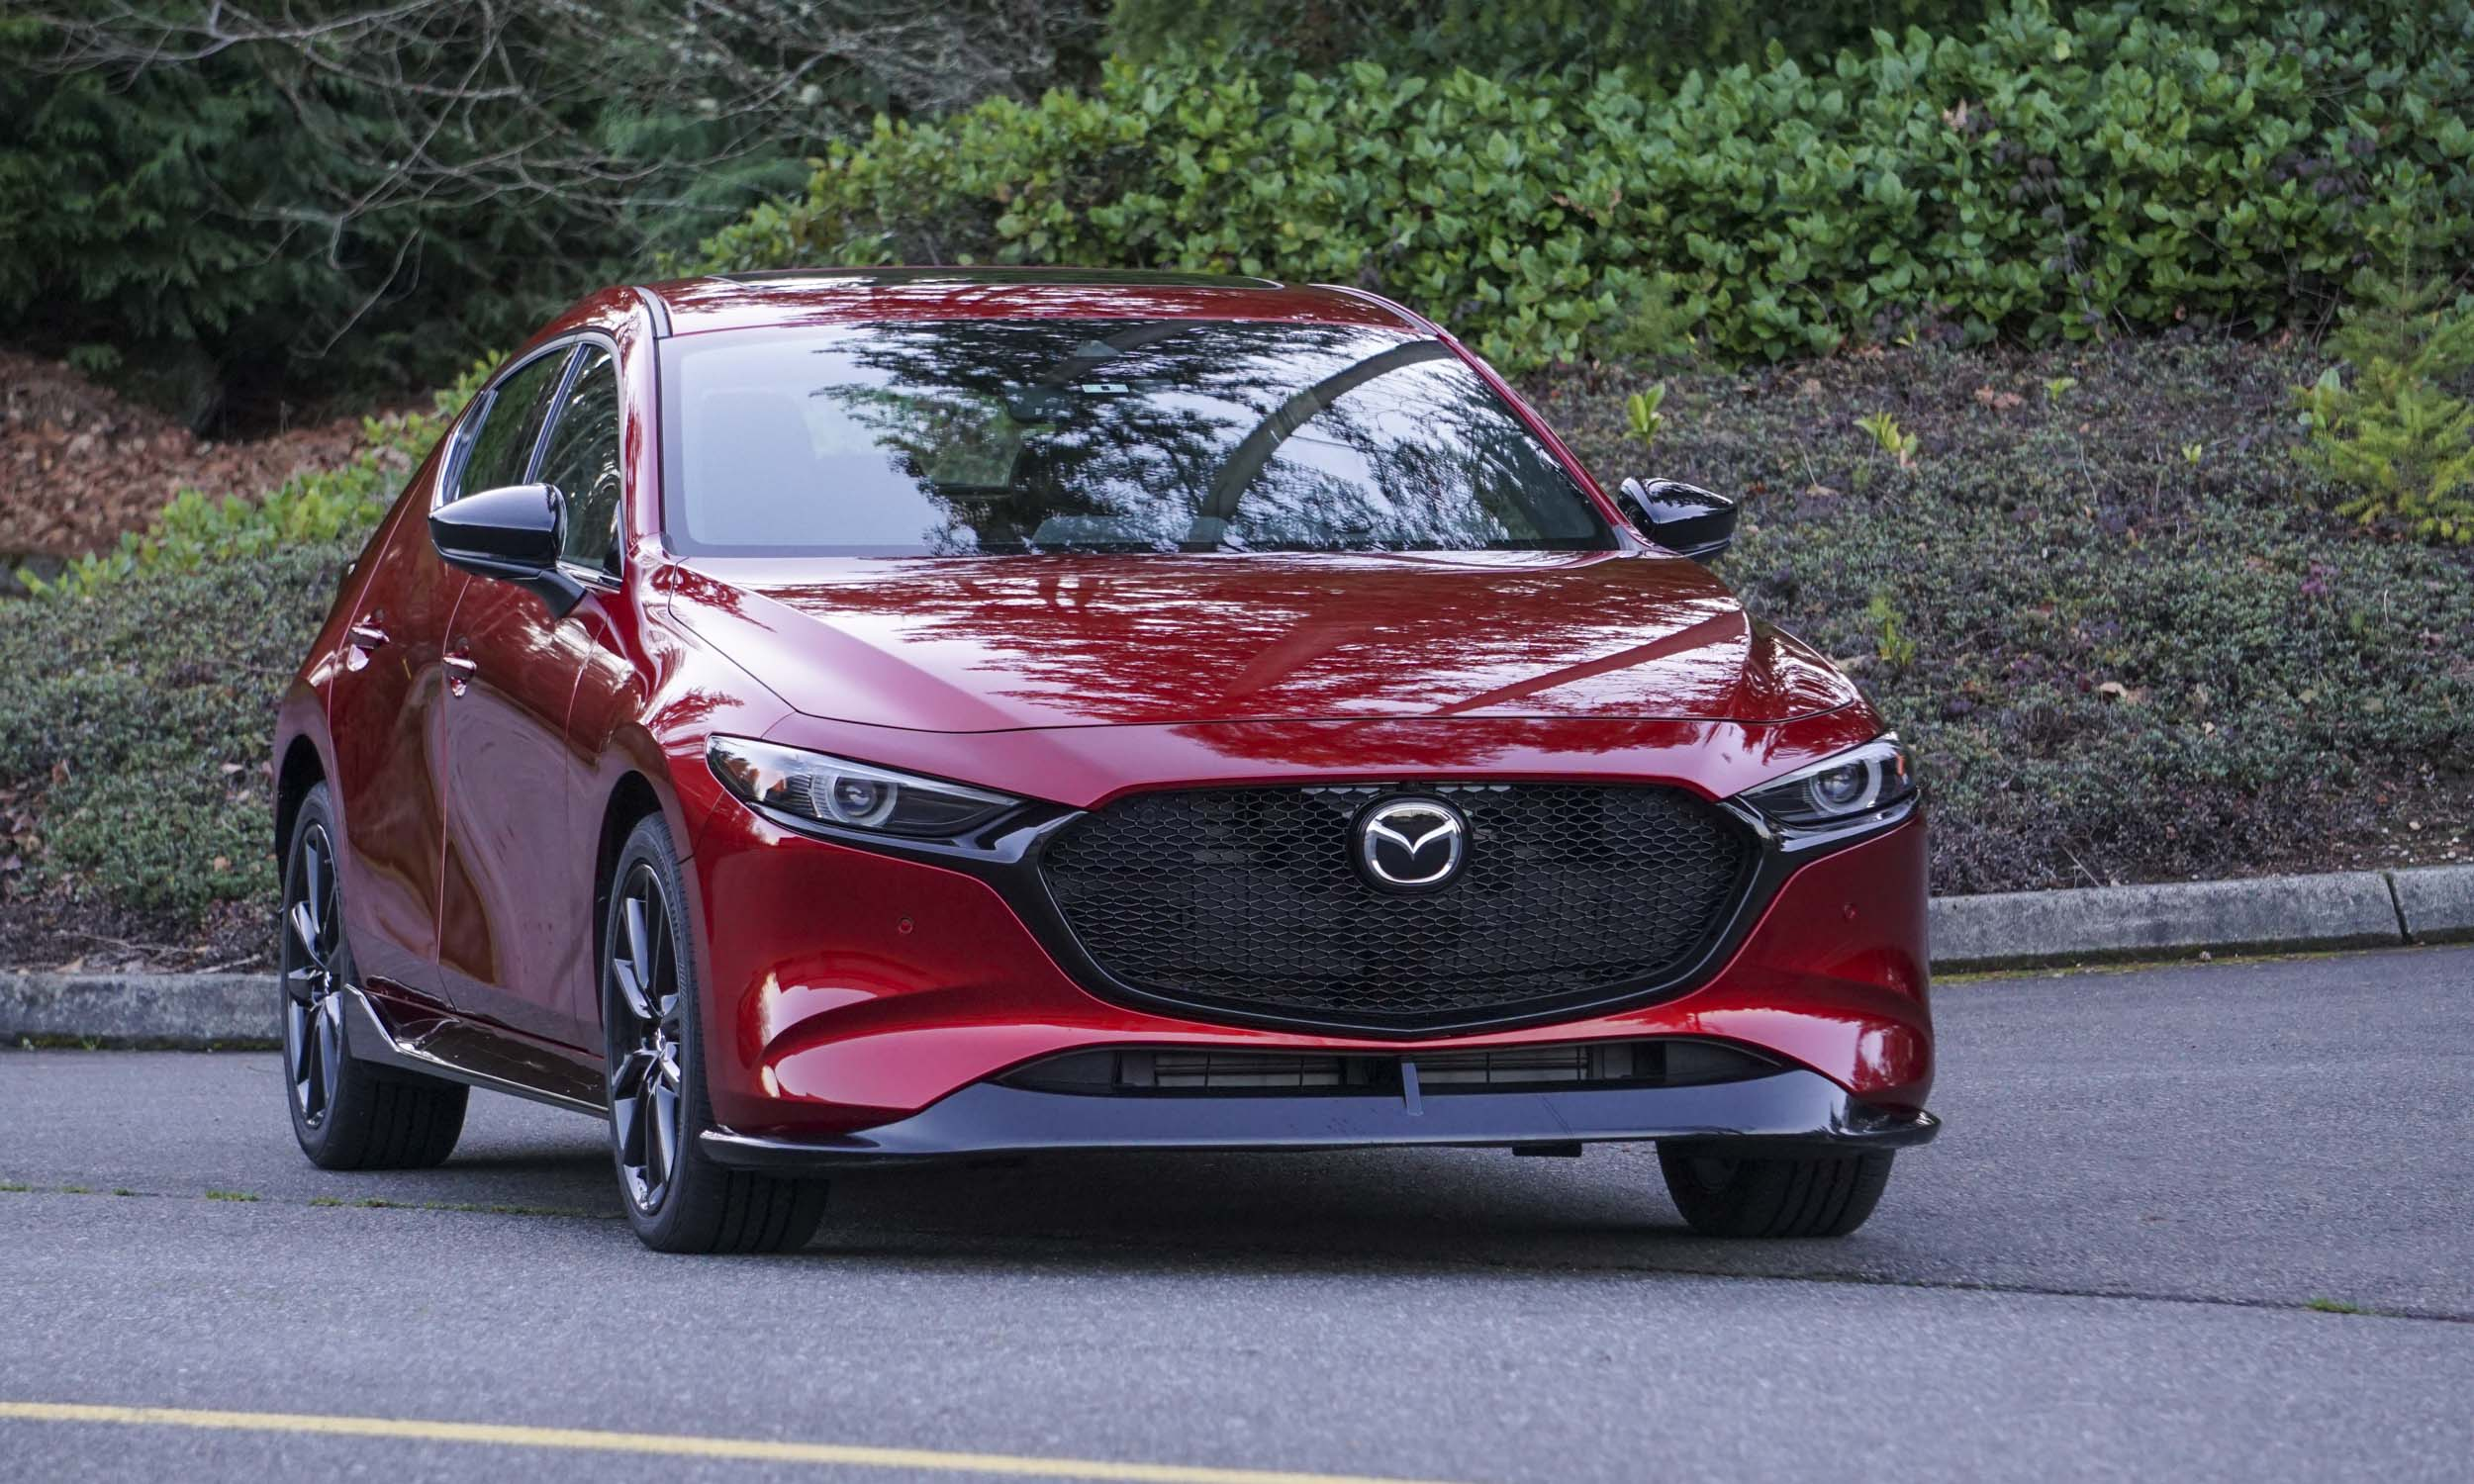 2021 mazda mazda3 2.5 turbo: review - » autonxt